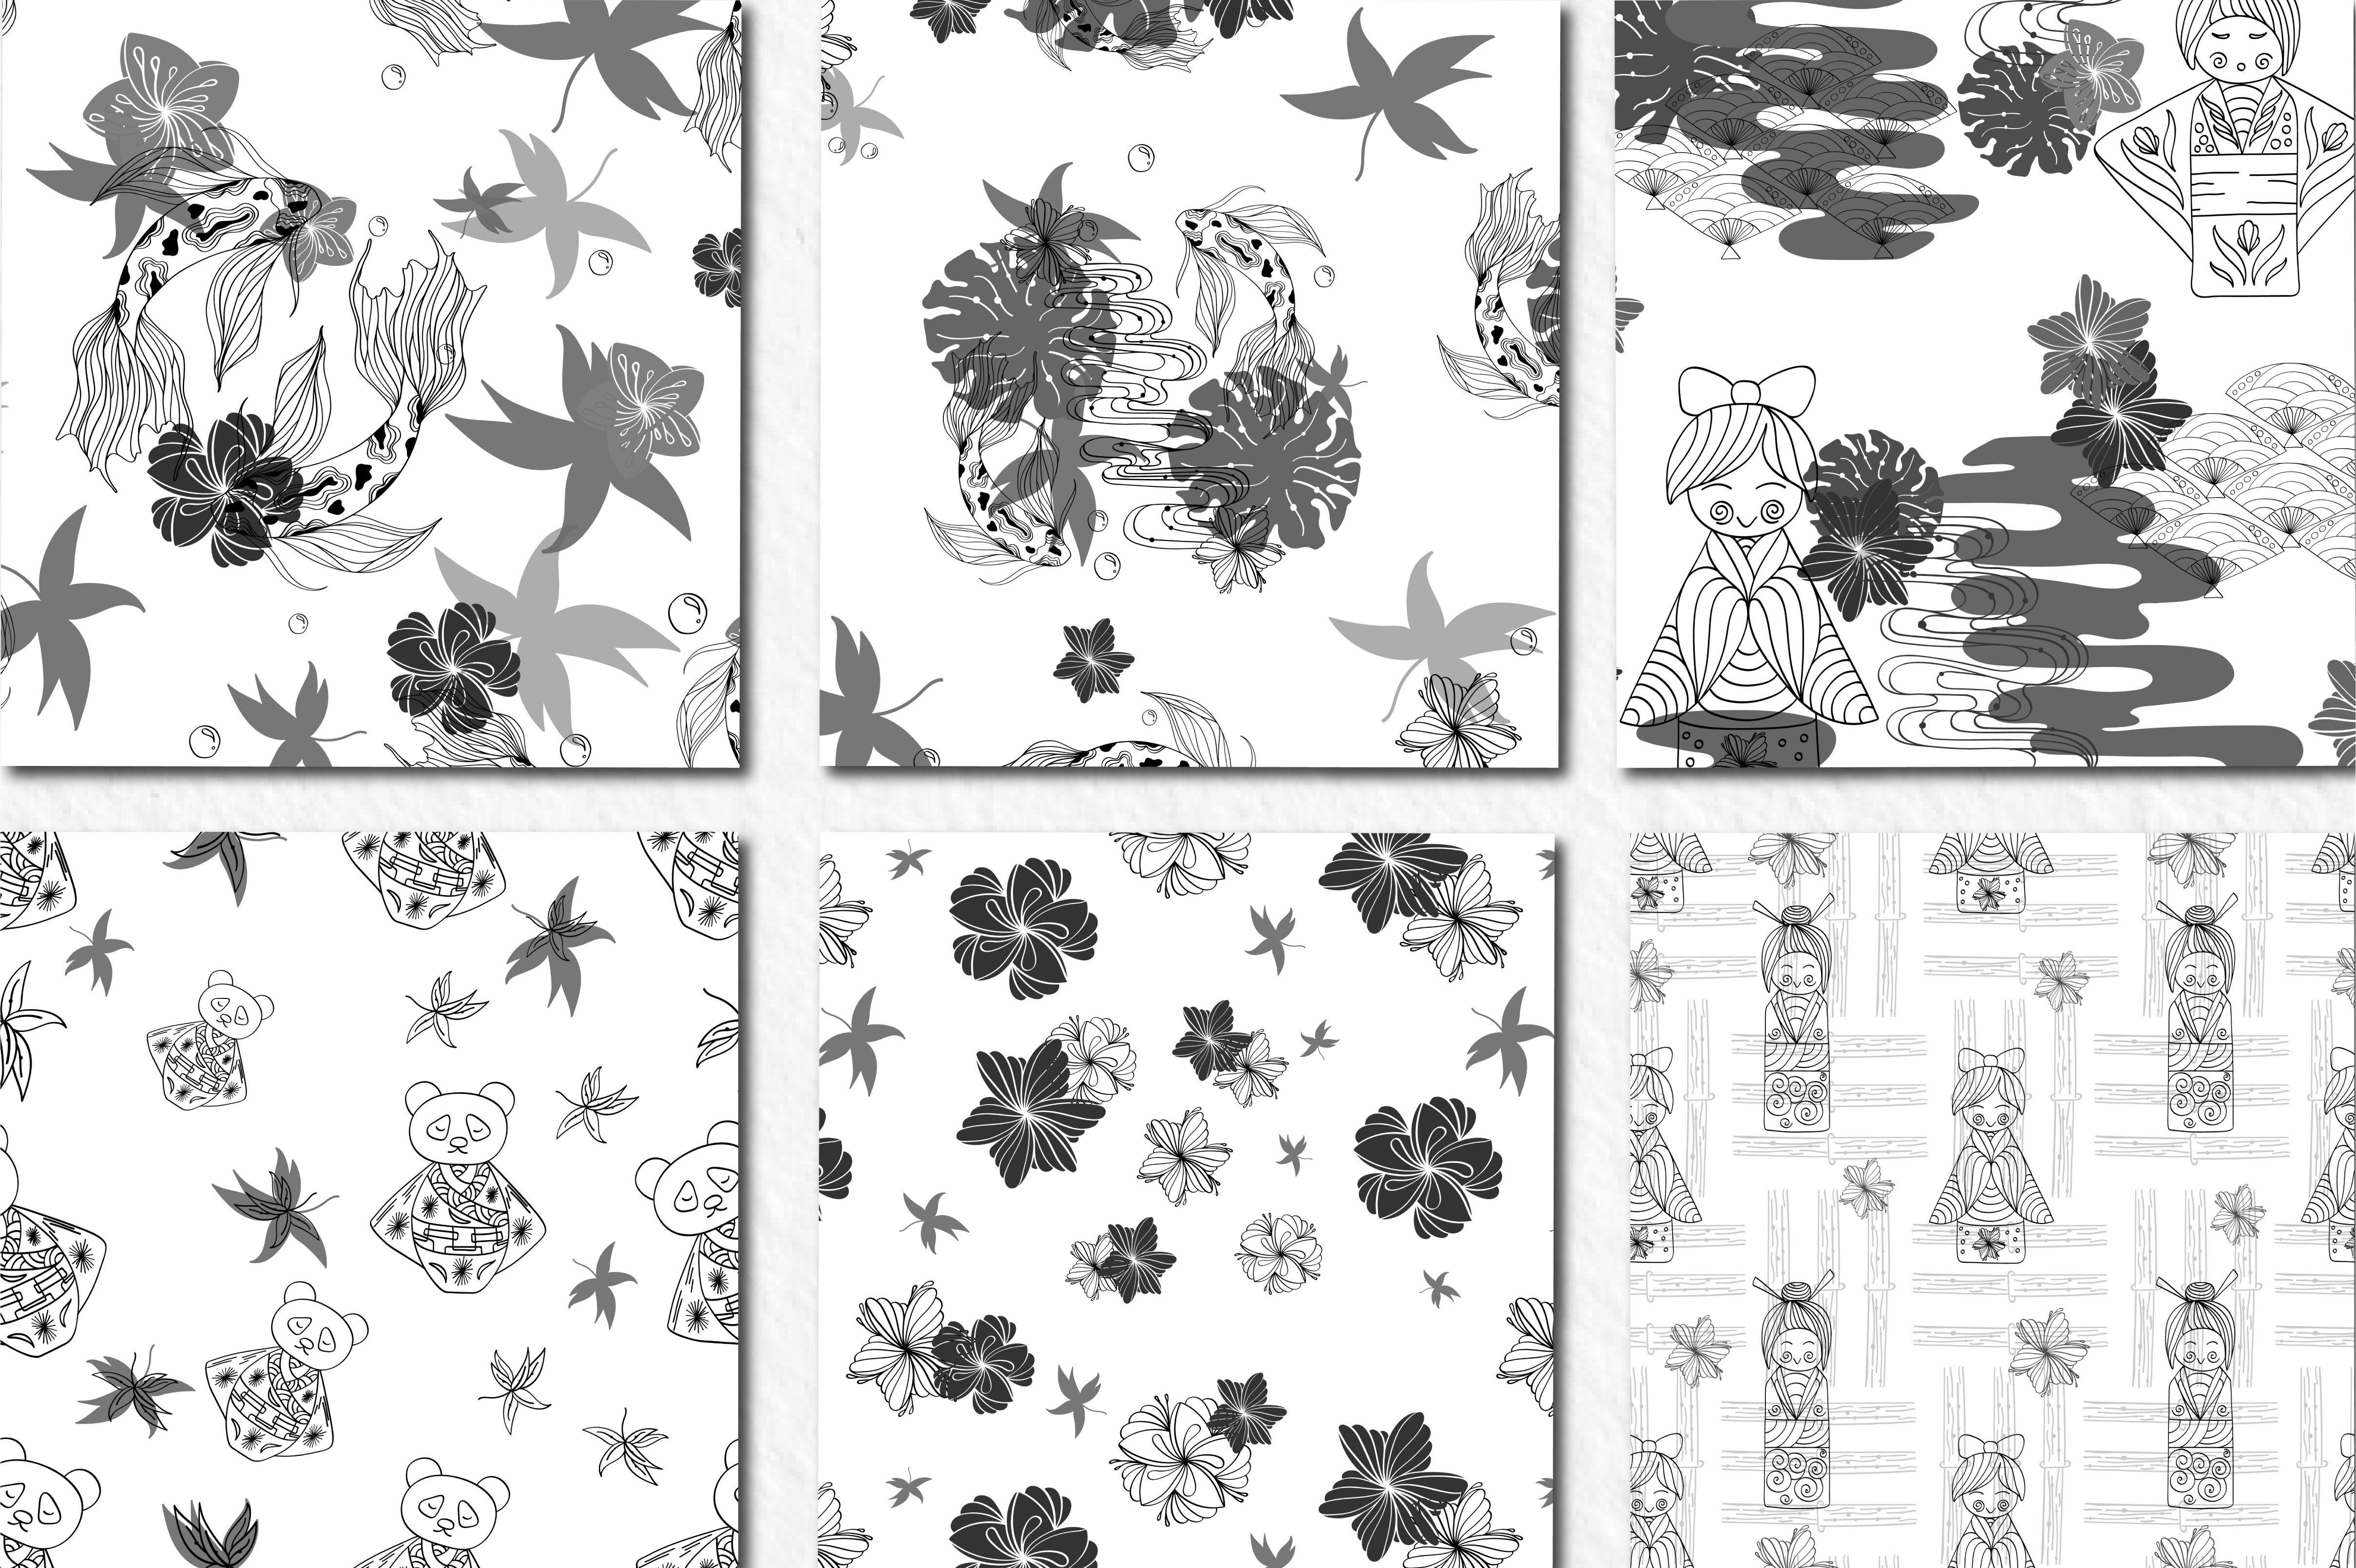 Line Art Japanese Pattern Collection By Zenart Studio By Tatyana